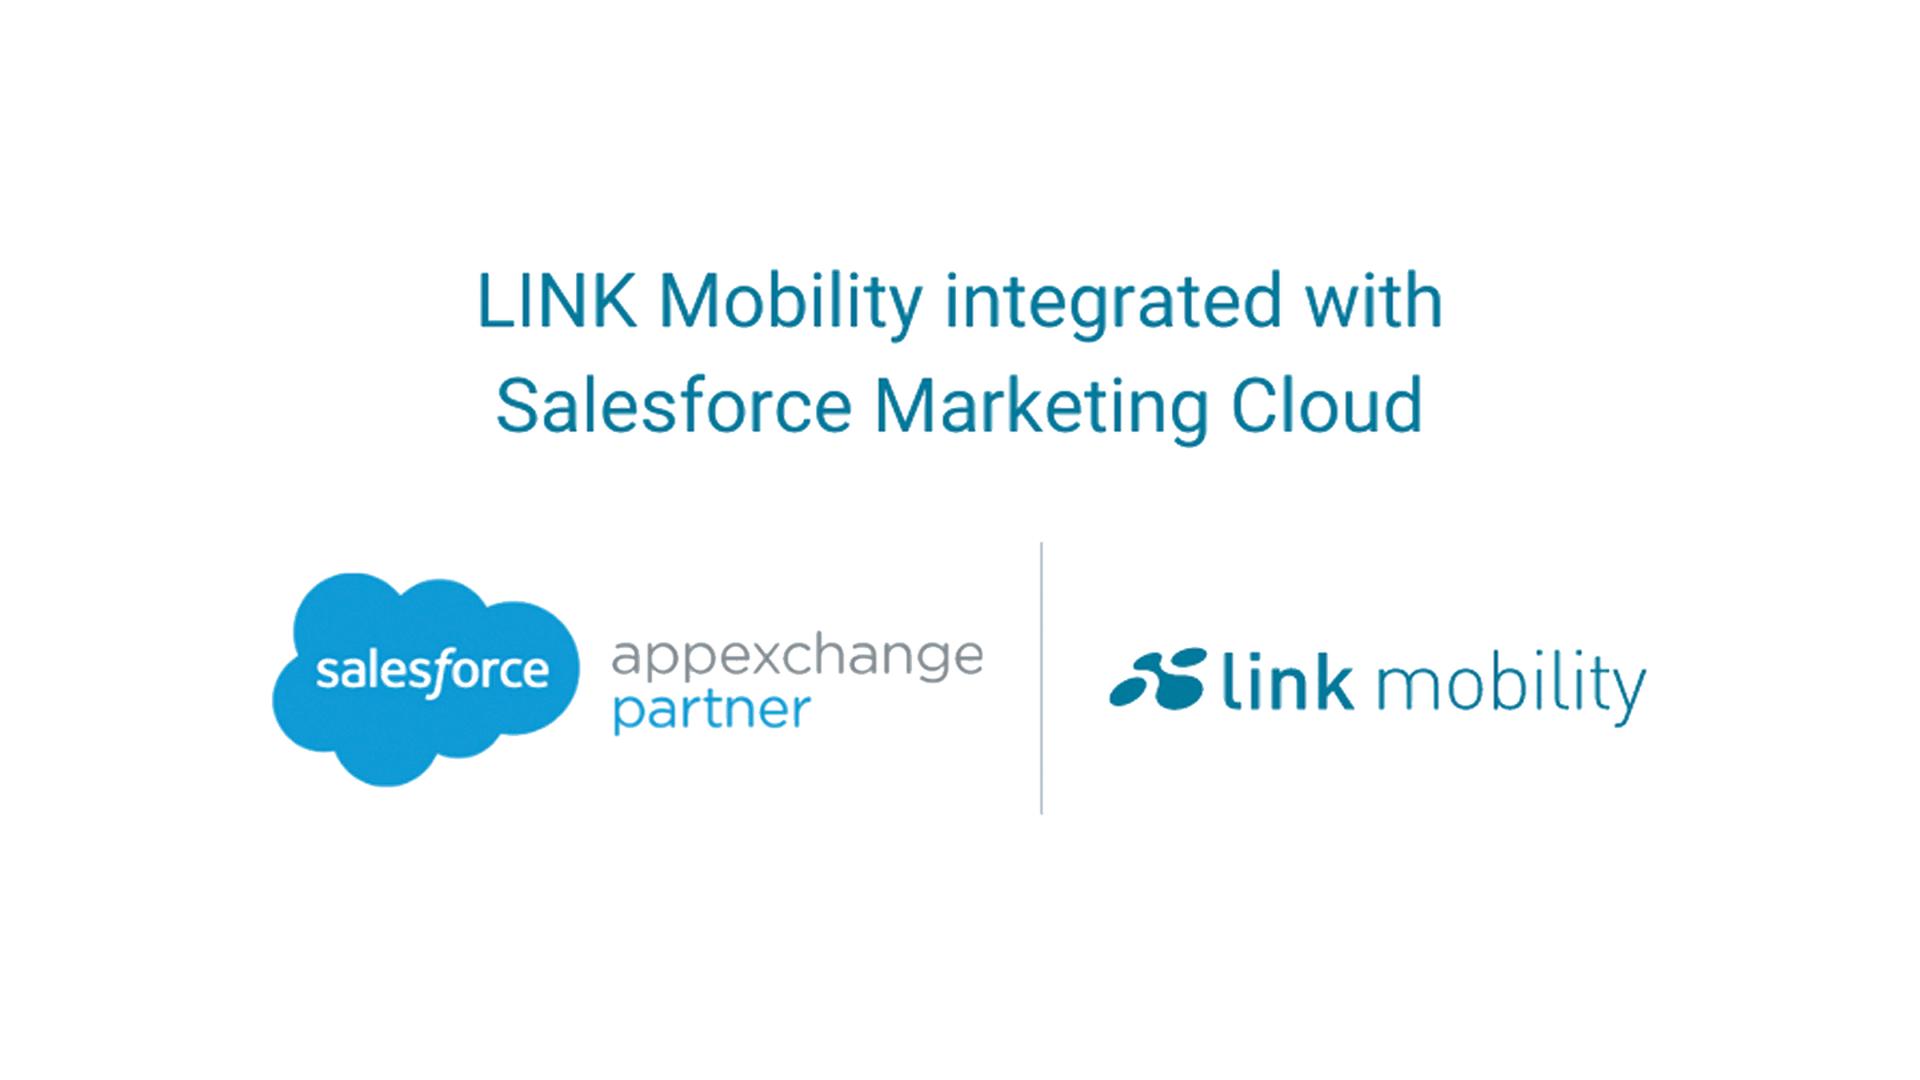 LINK Mobility - LINK Mobility Integration für die Salesforce Marketing Cloud